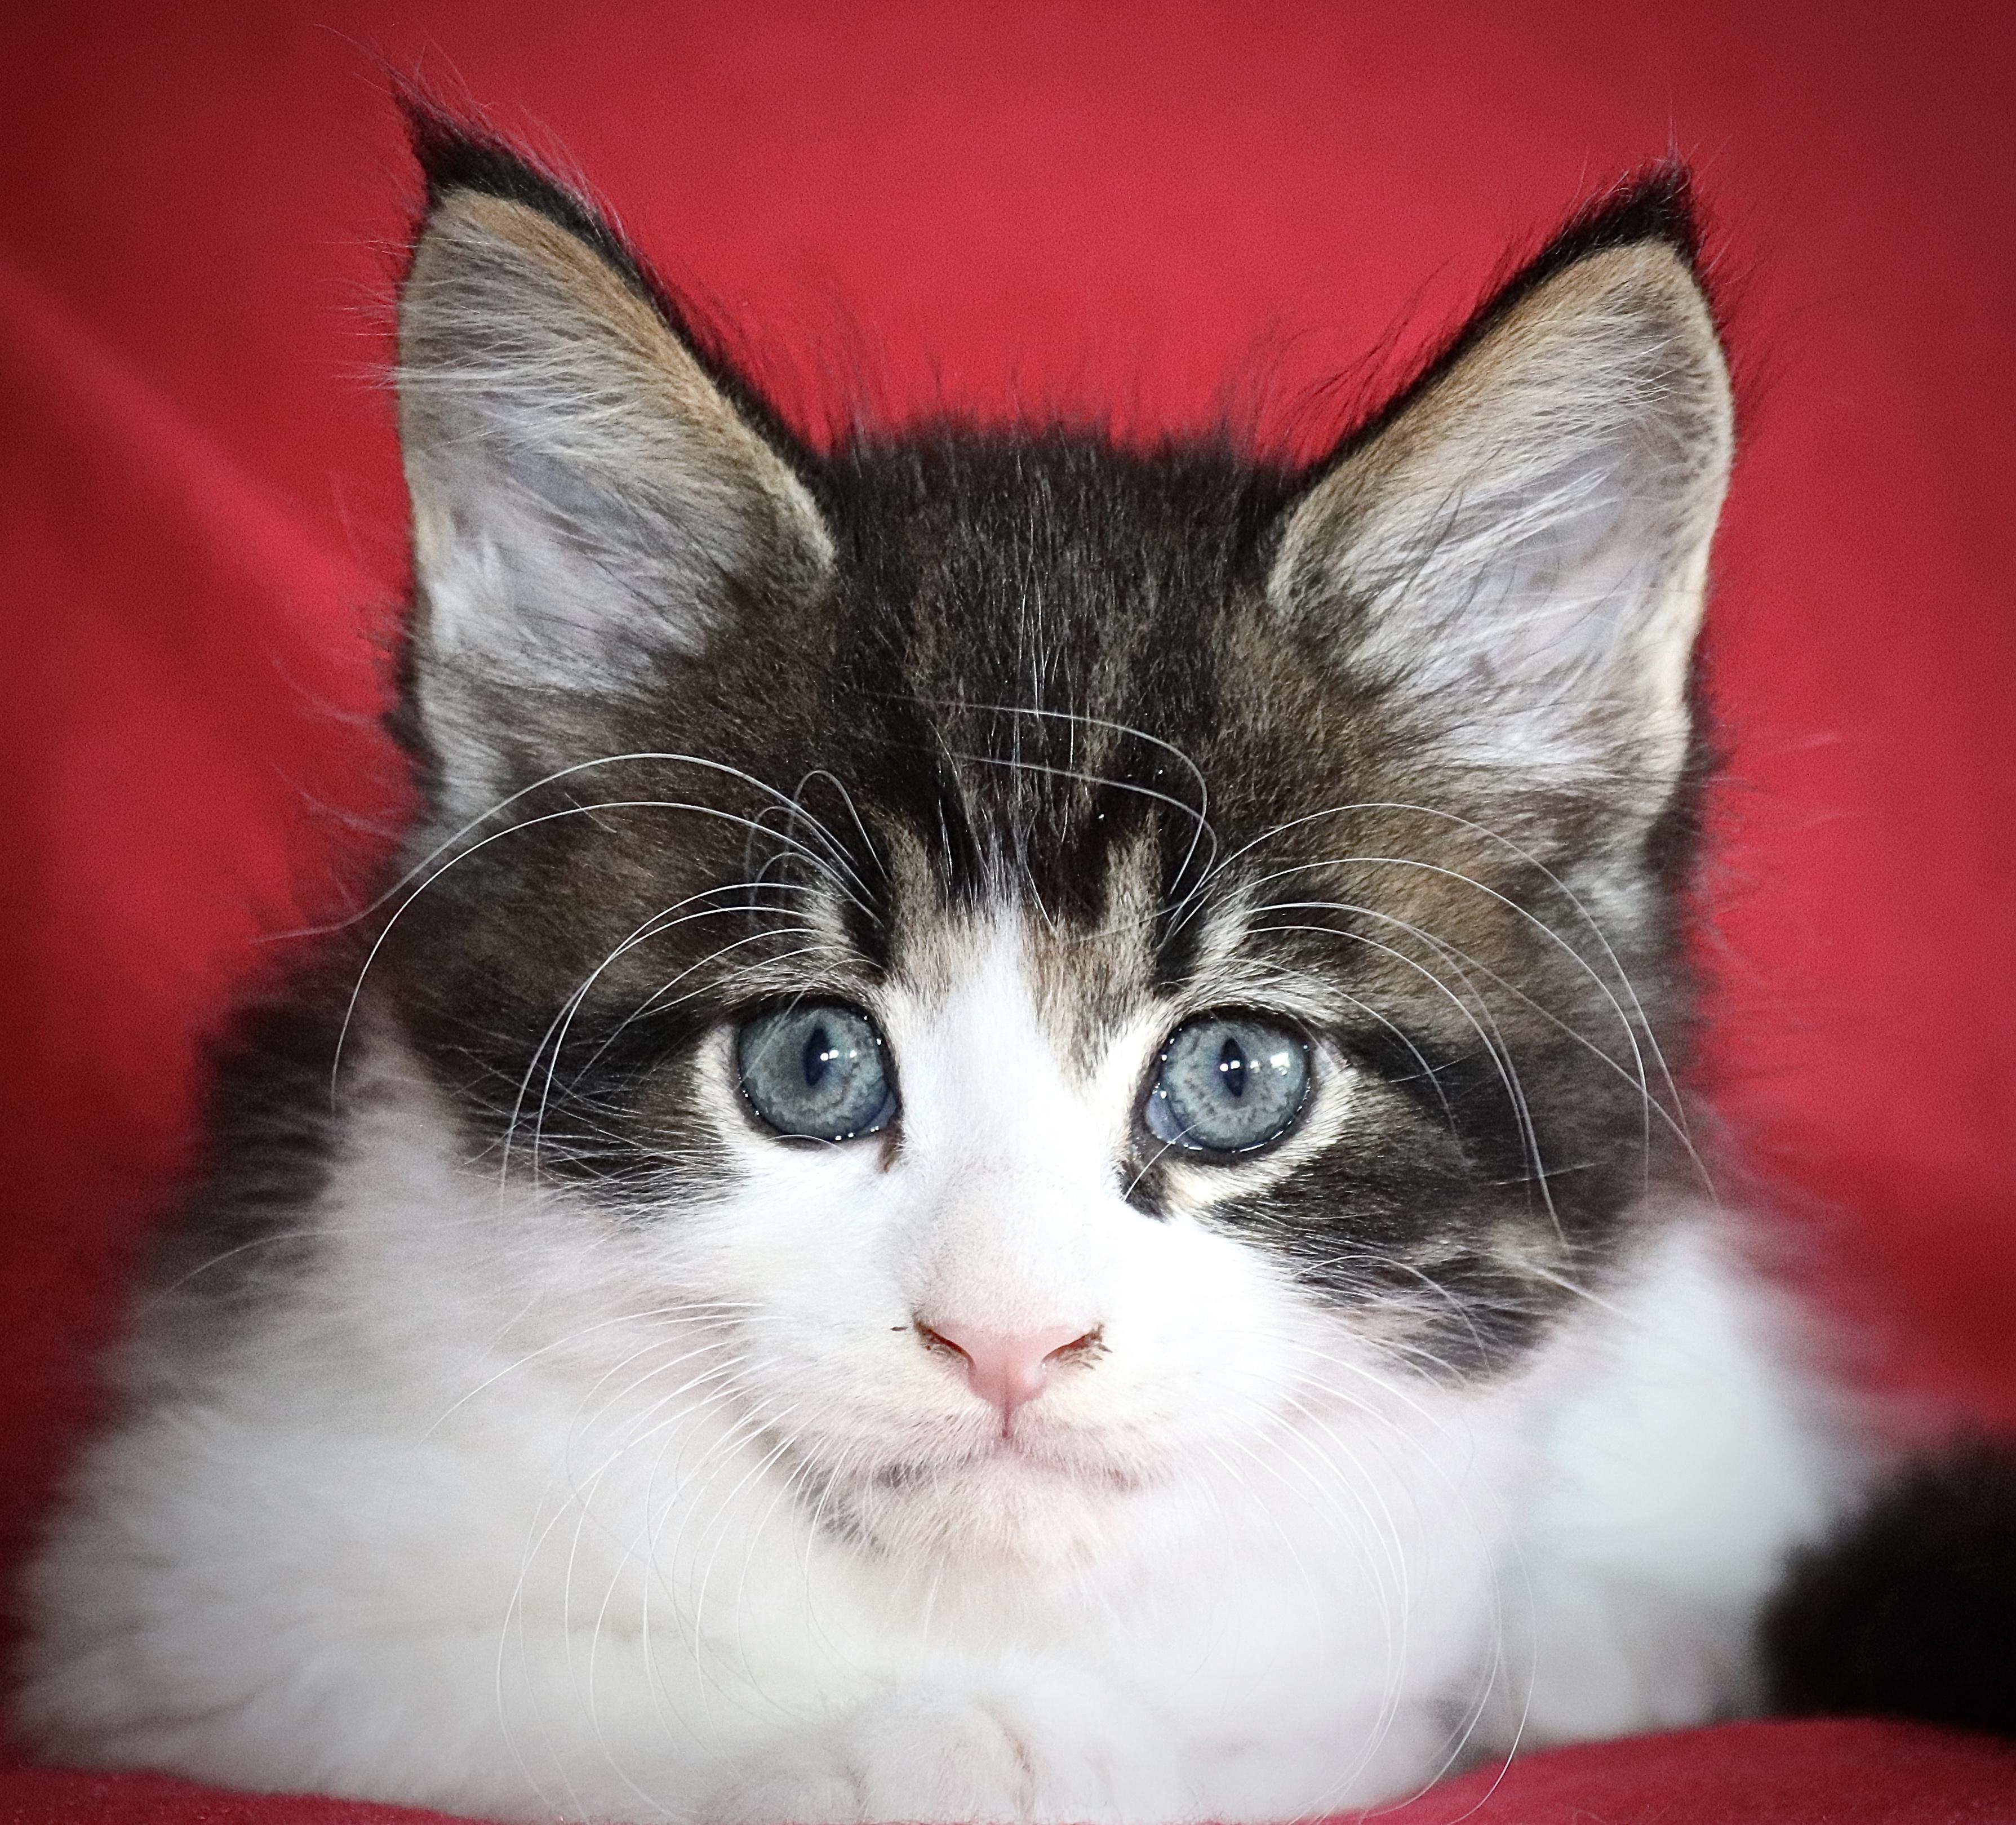 fotka kočky VRH I: INDOOR UNO VON ERILLIAN*CZ